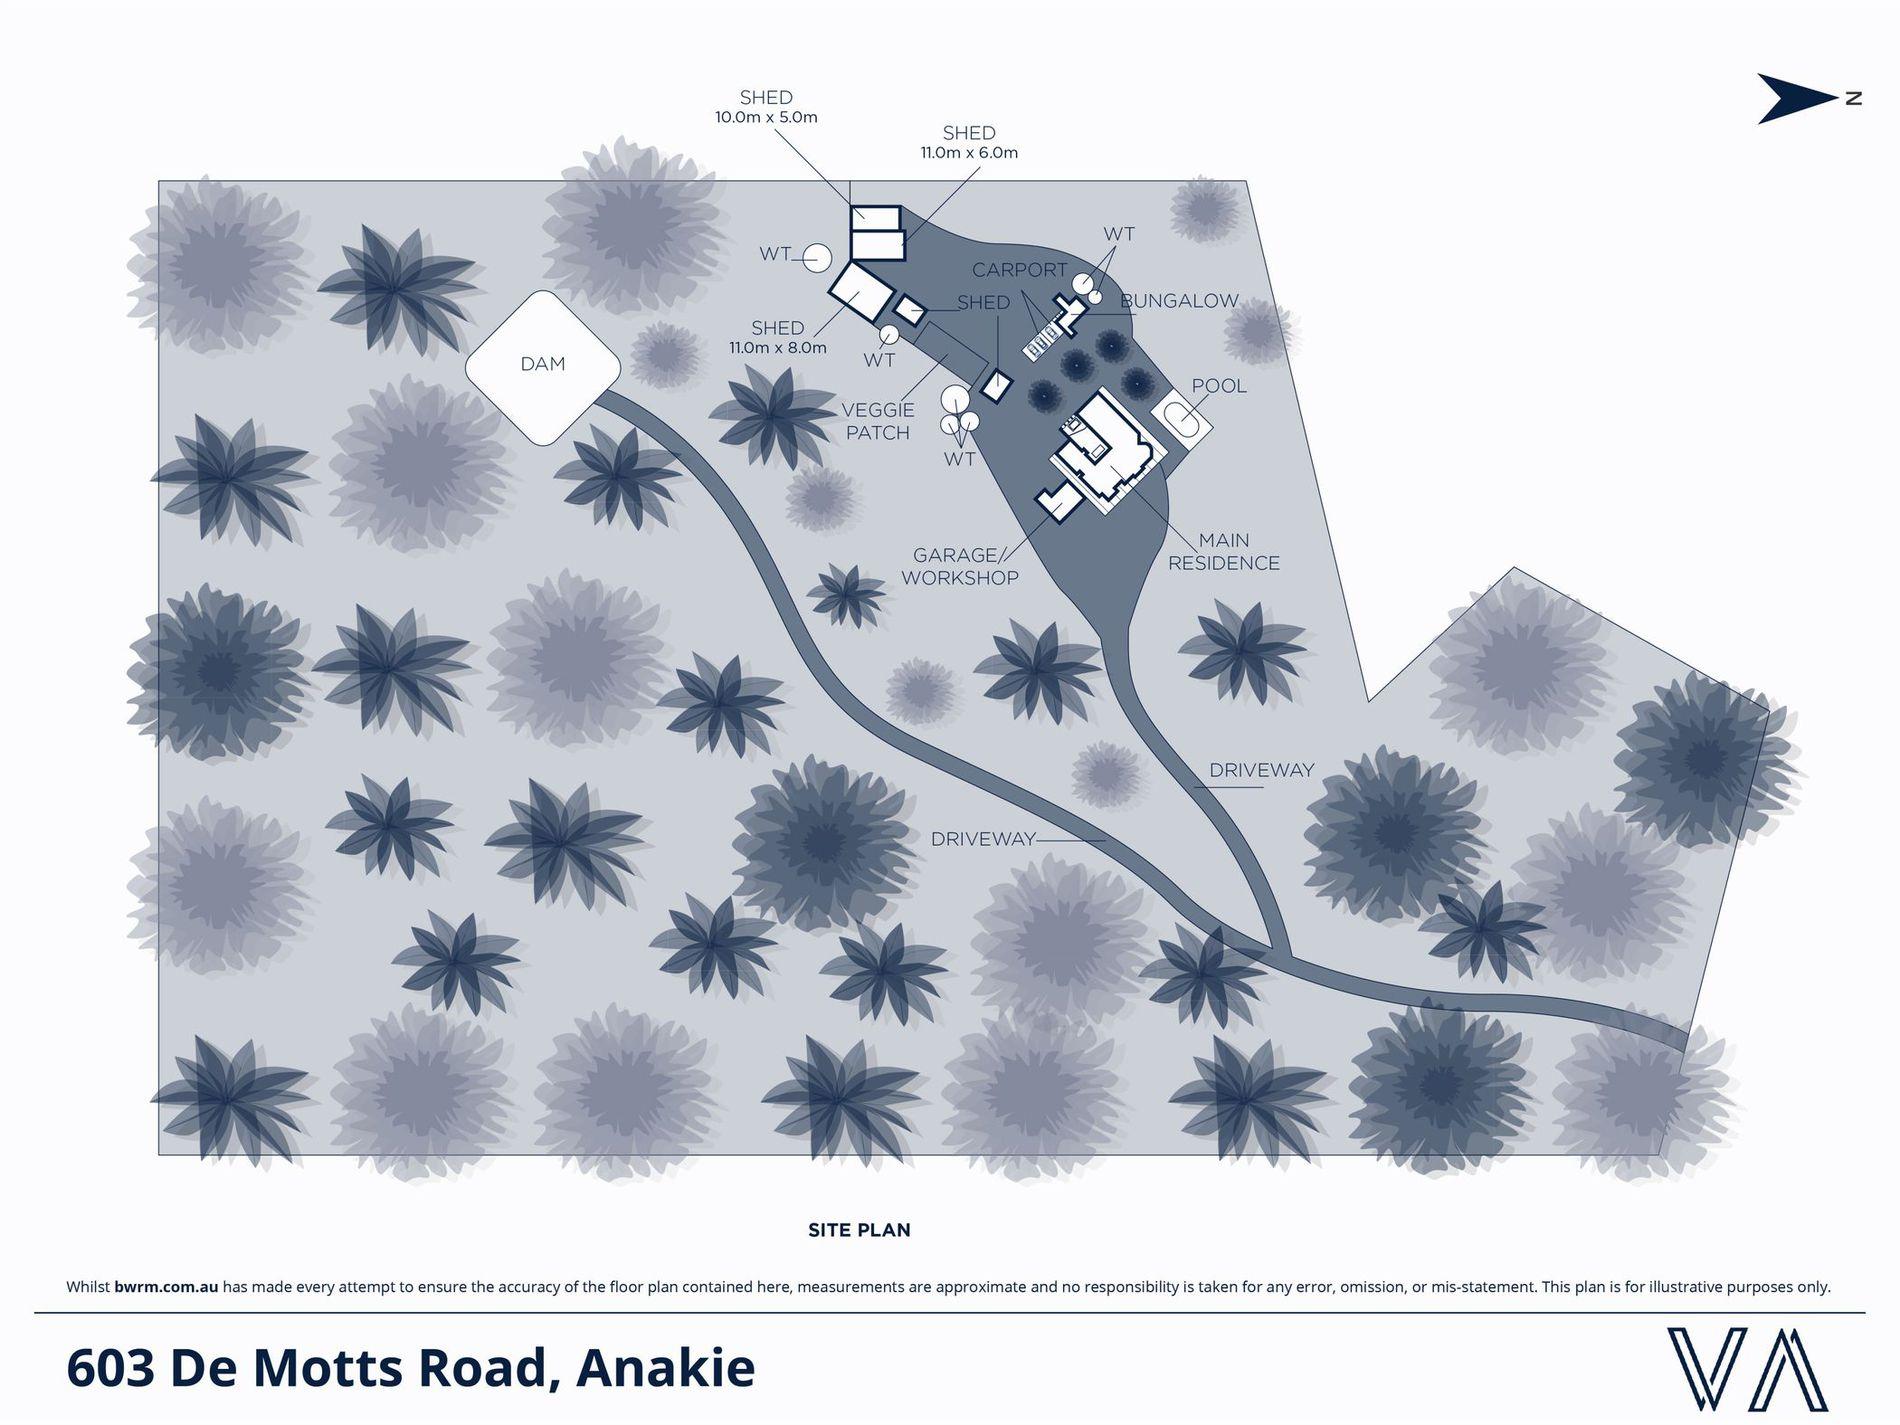 603 De Motts Road, Anakie